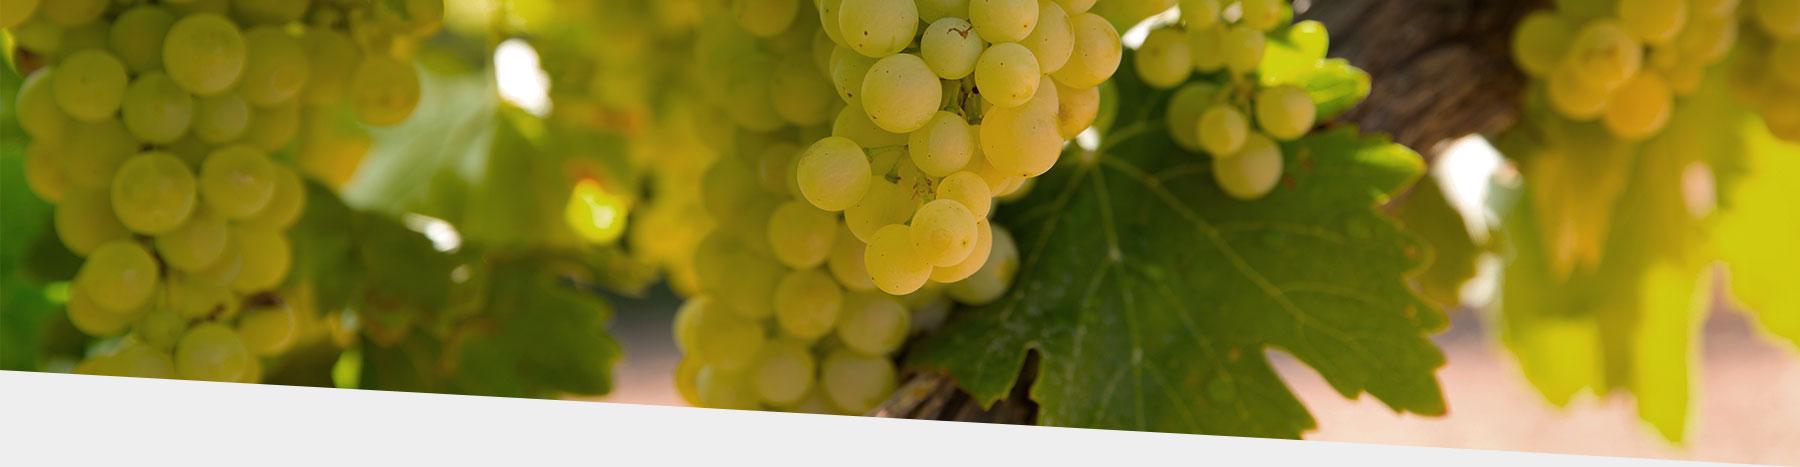 Debina semisparkle wine, domaine glinavos